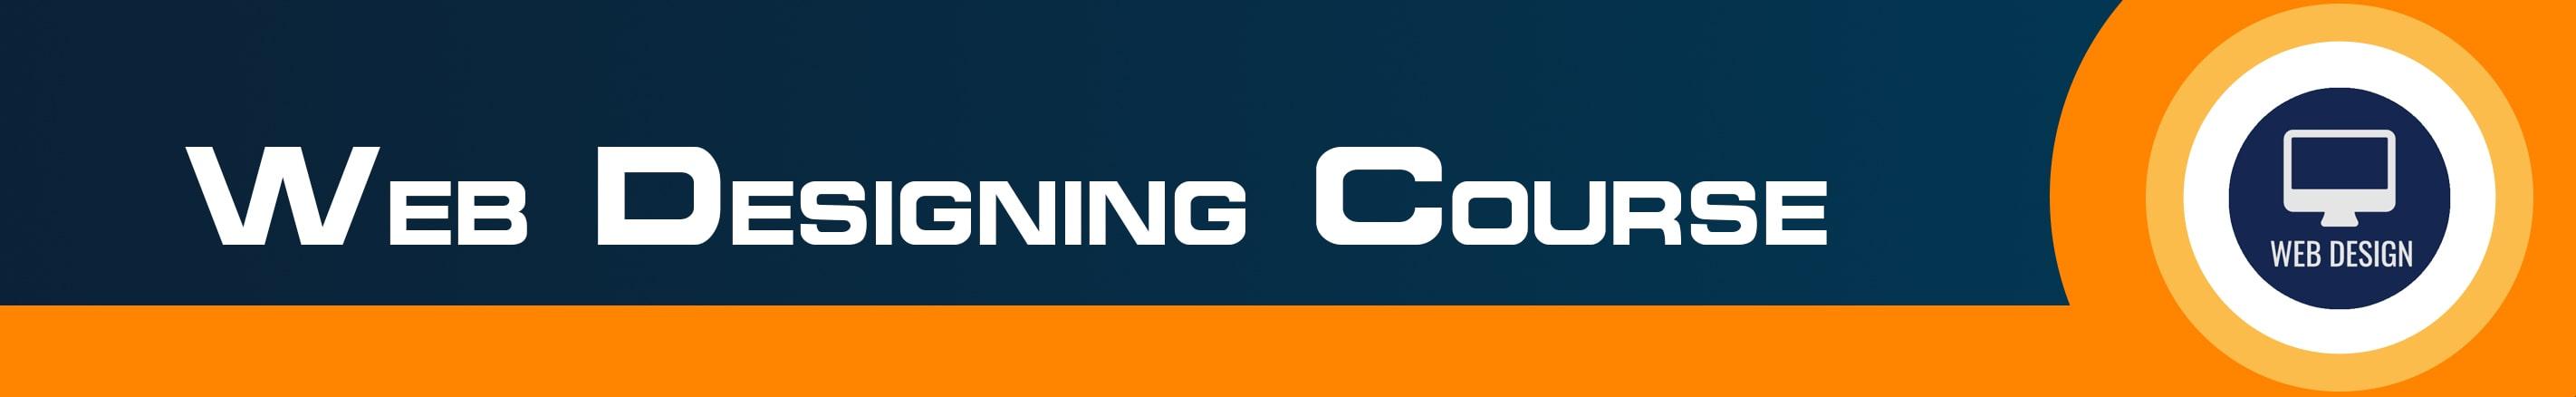 Web-Designing-Course